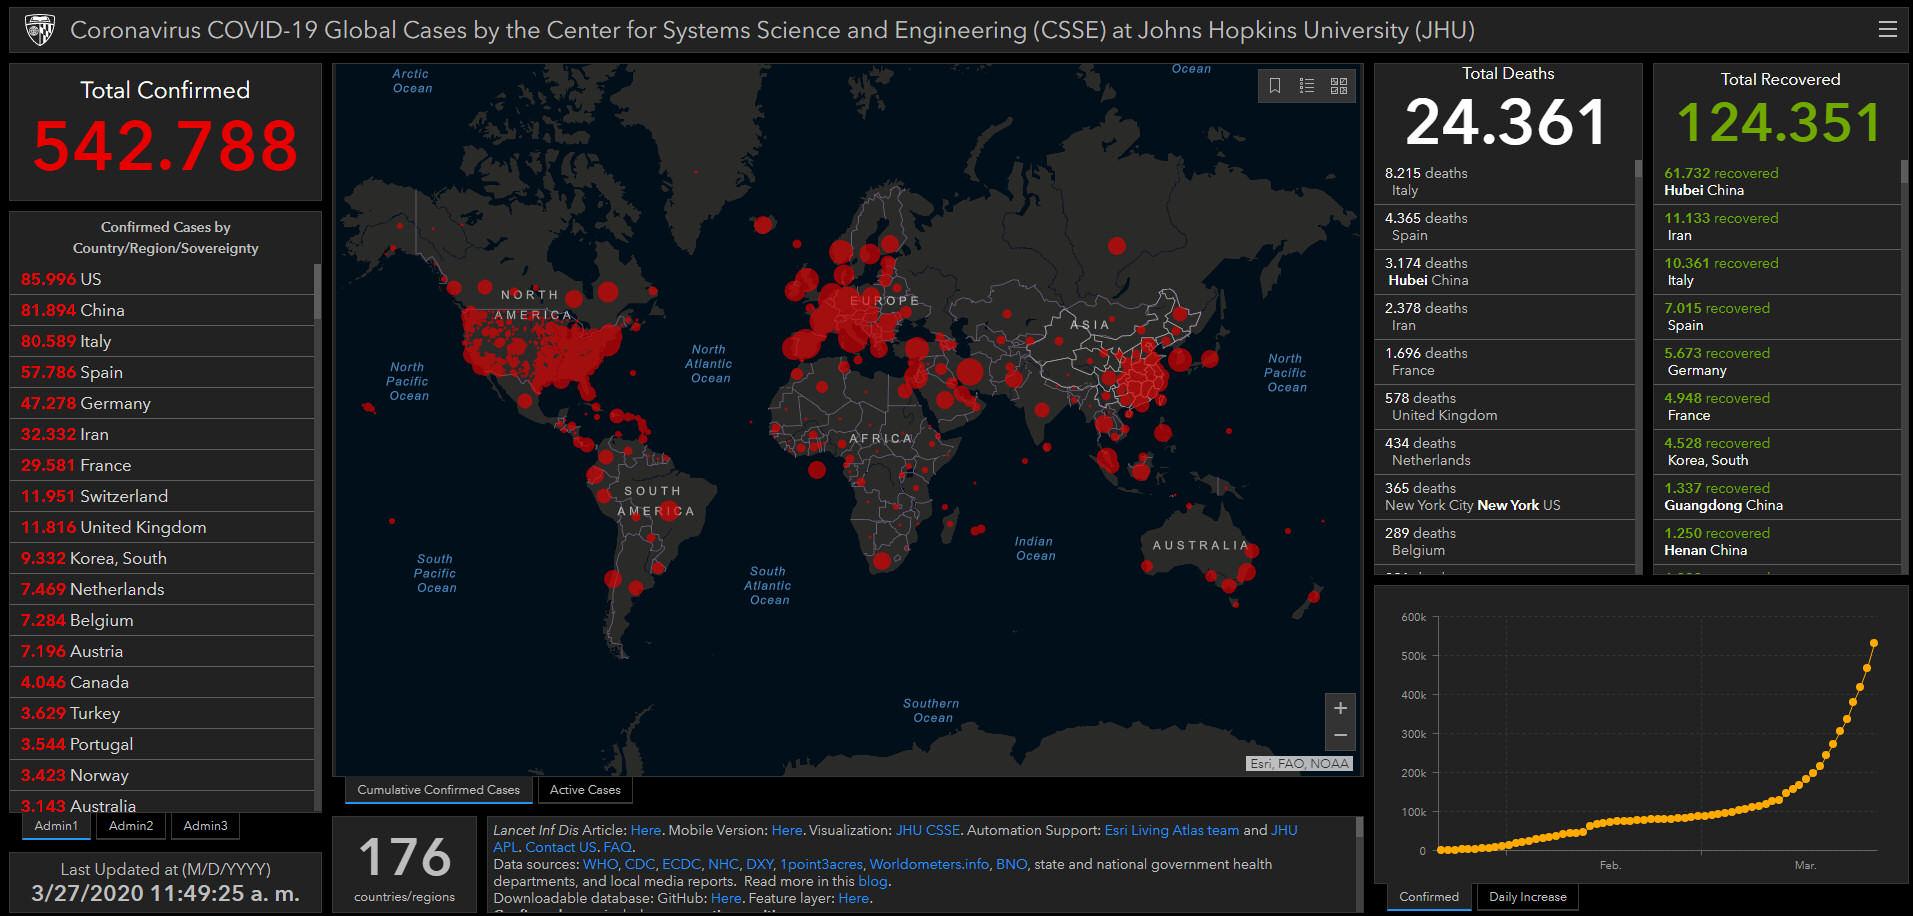 coronavirus covid-19 estadisticas globales mapa 27 marzo 2020